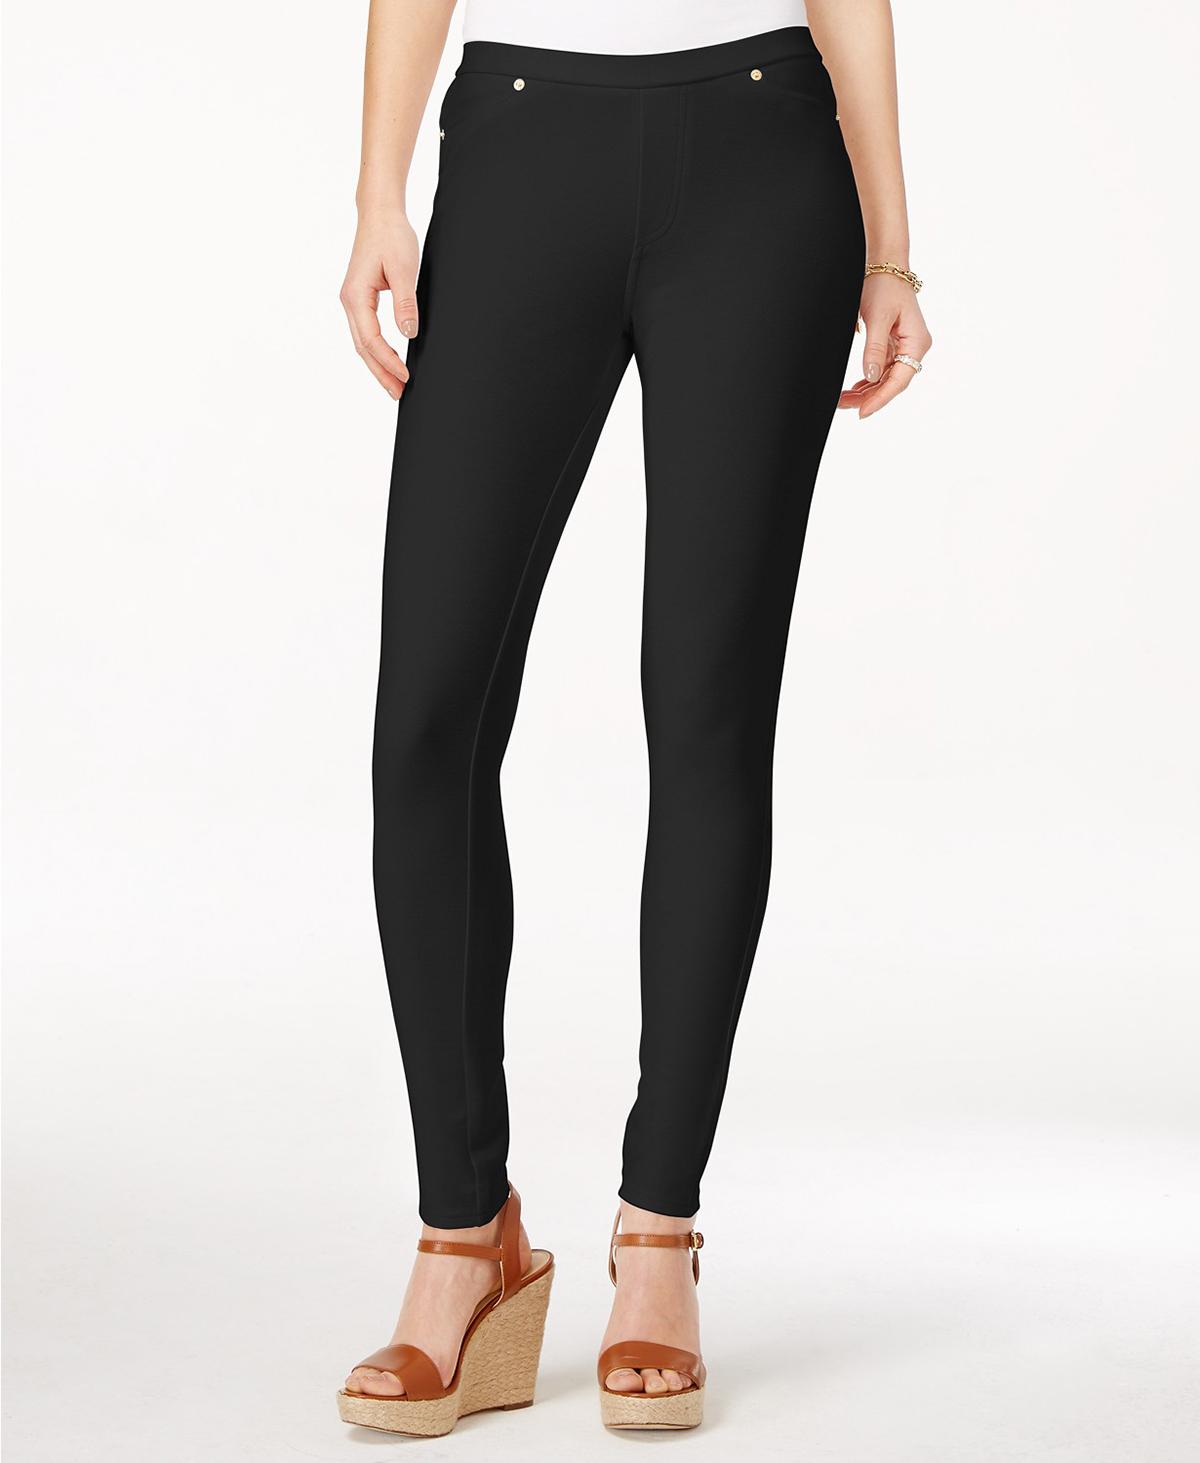 MK leggings